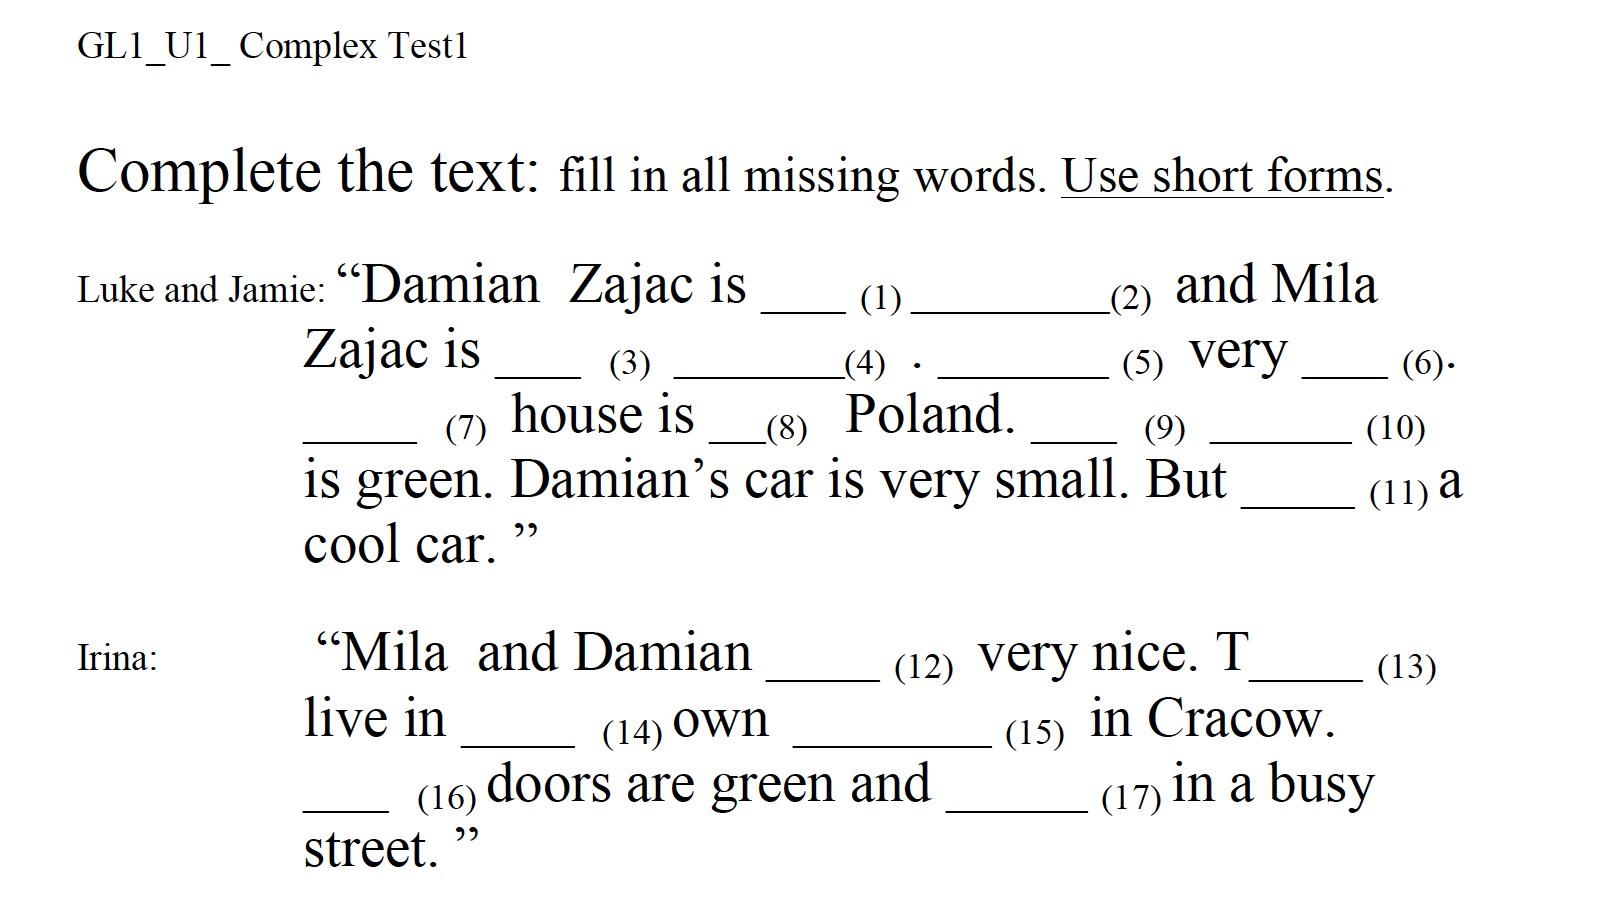 GL1_U1_Testa